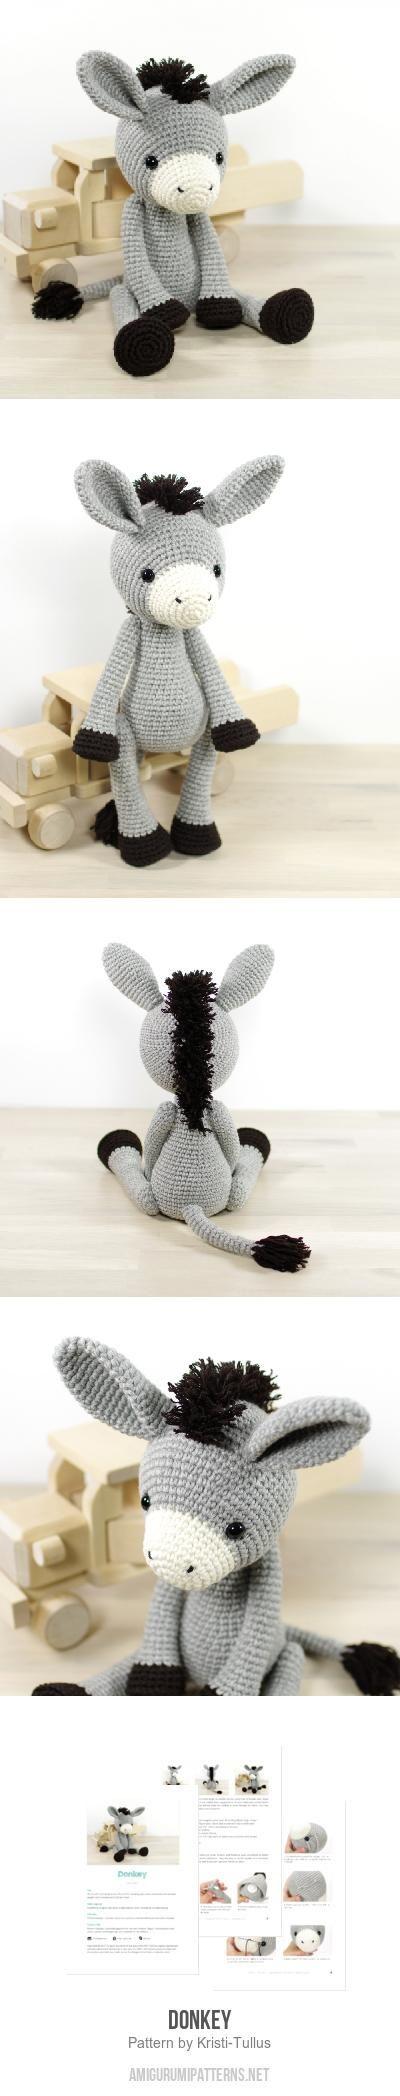 Donkey amigurumi pattern by Kristi Tullus | Ganchillo, Tejido y ...